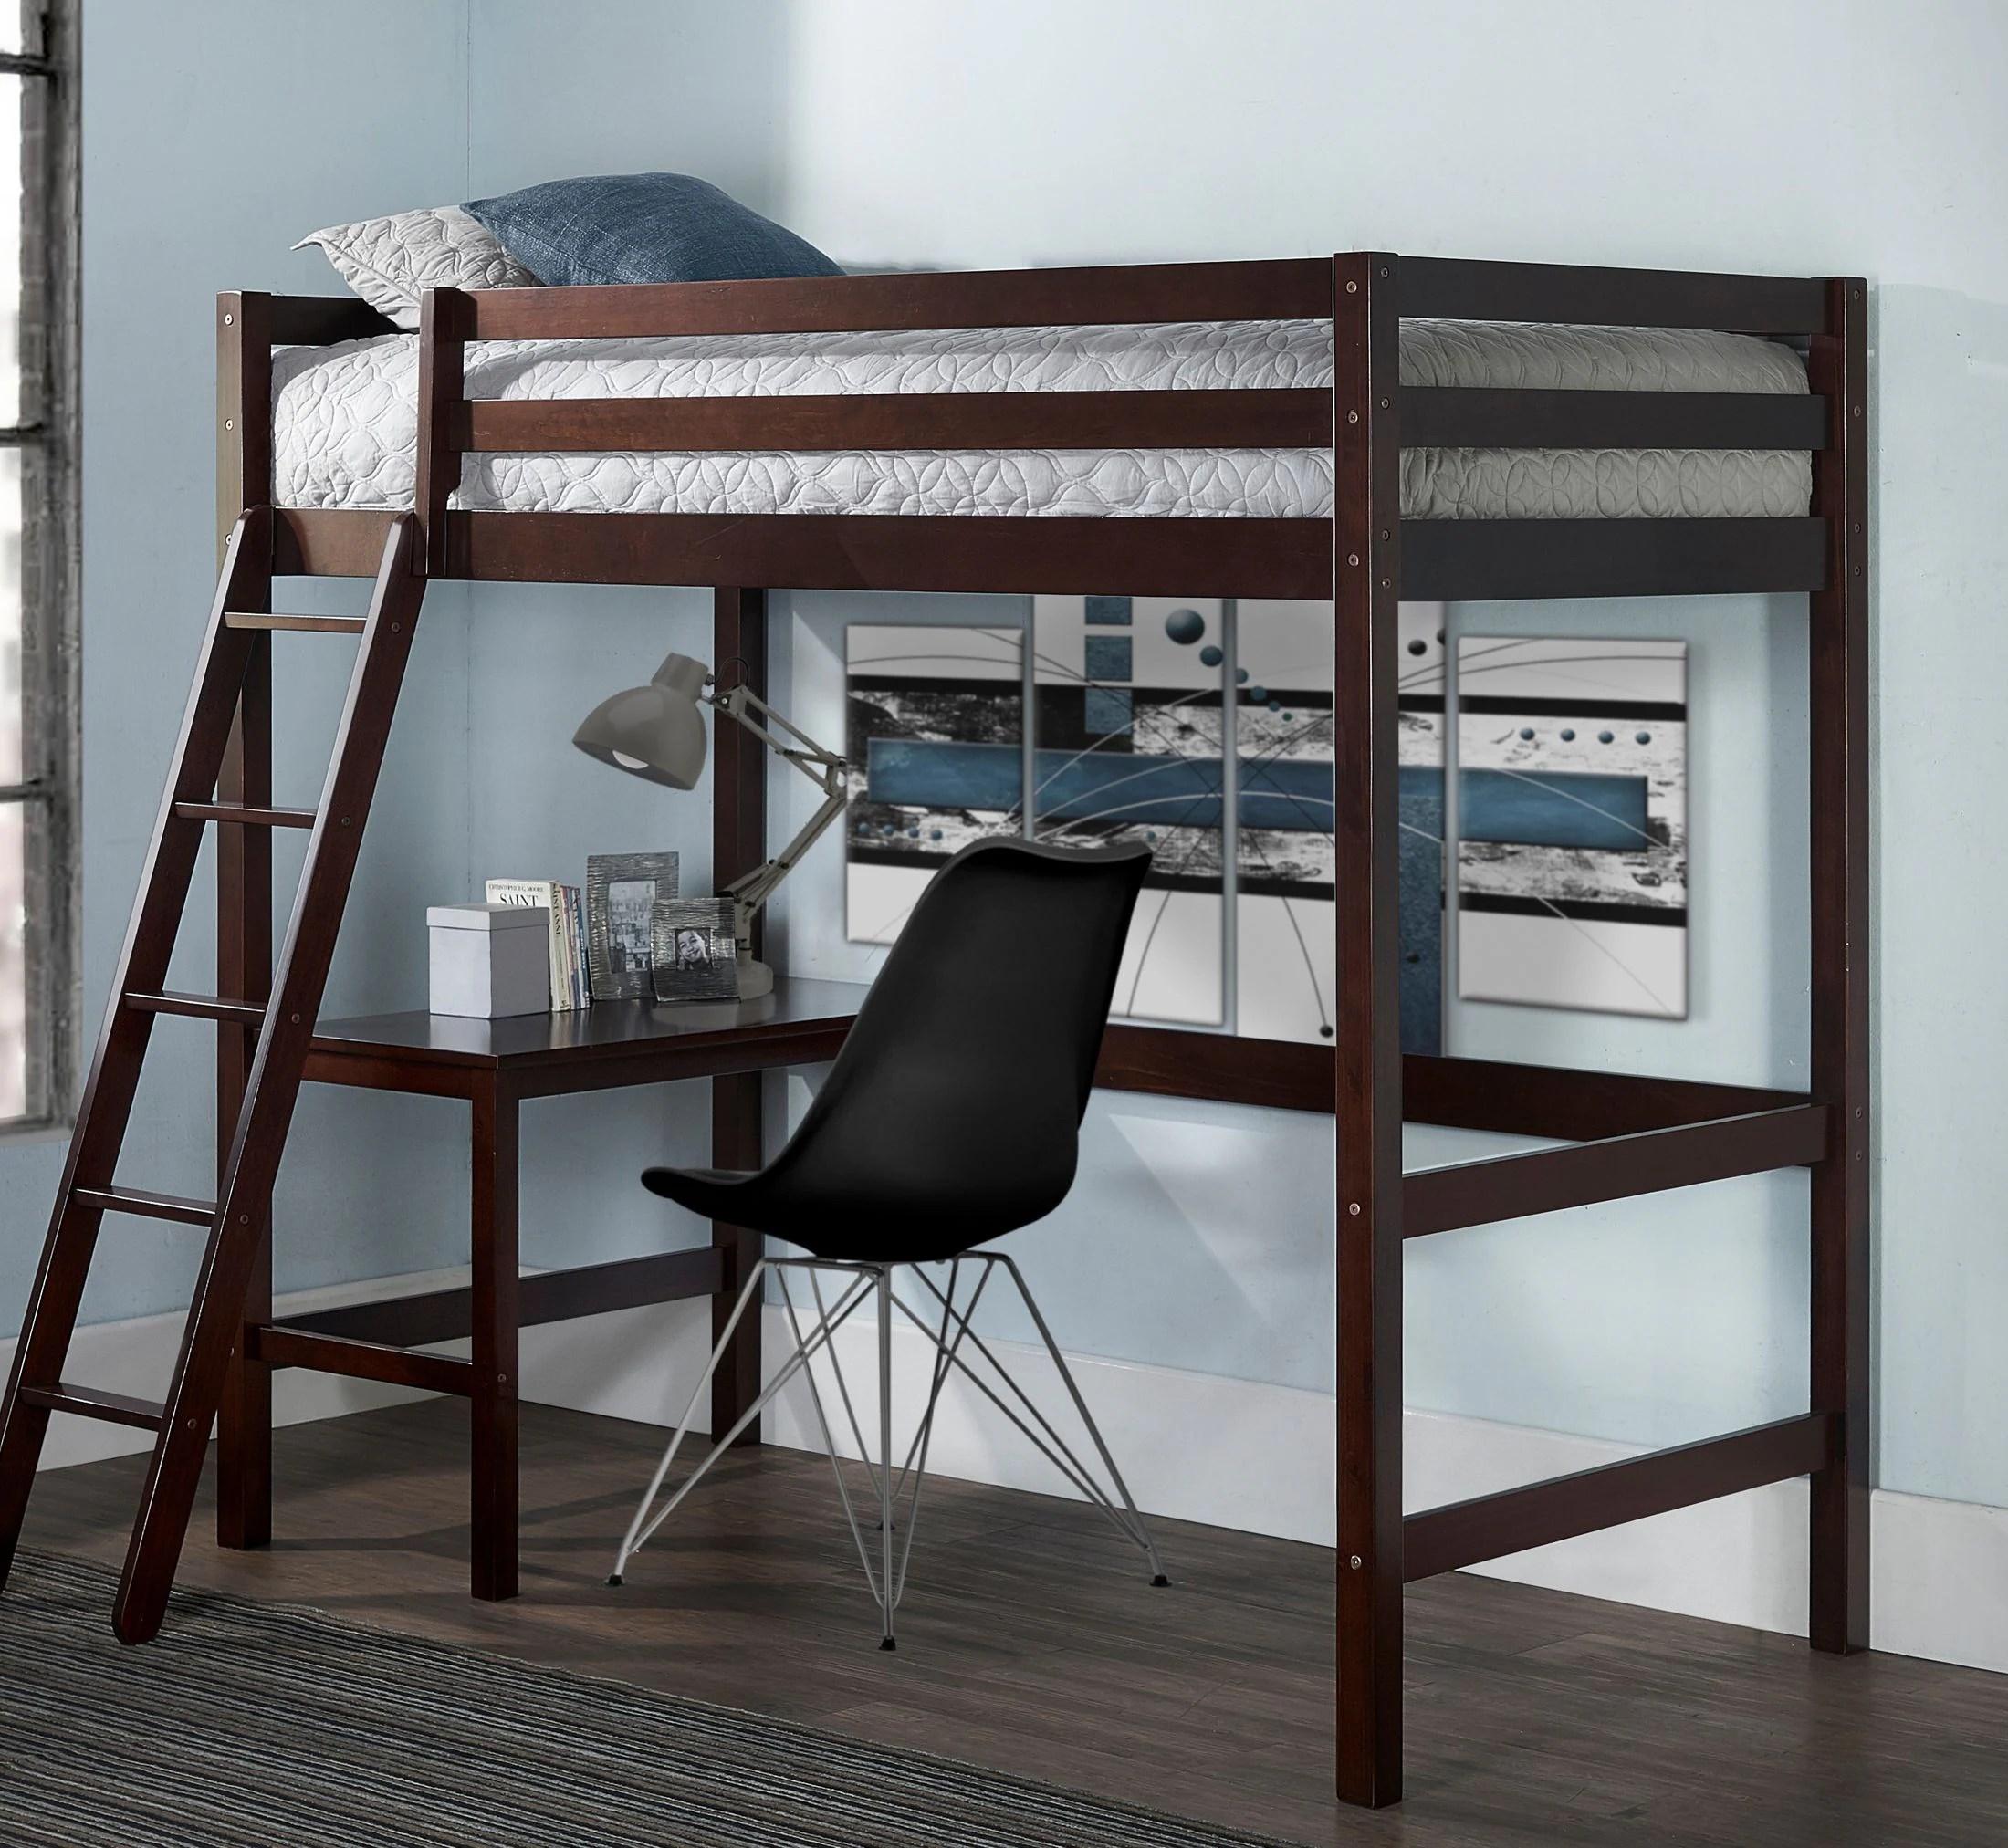 value city loft bed cheaper than retail